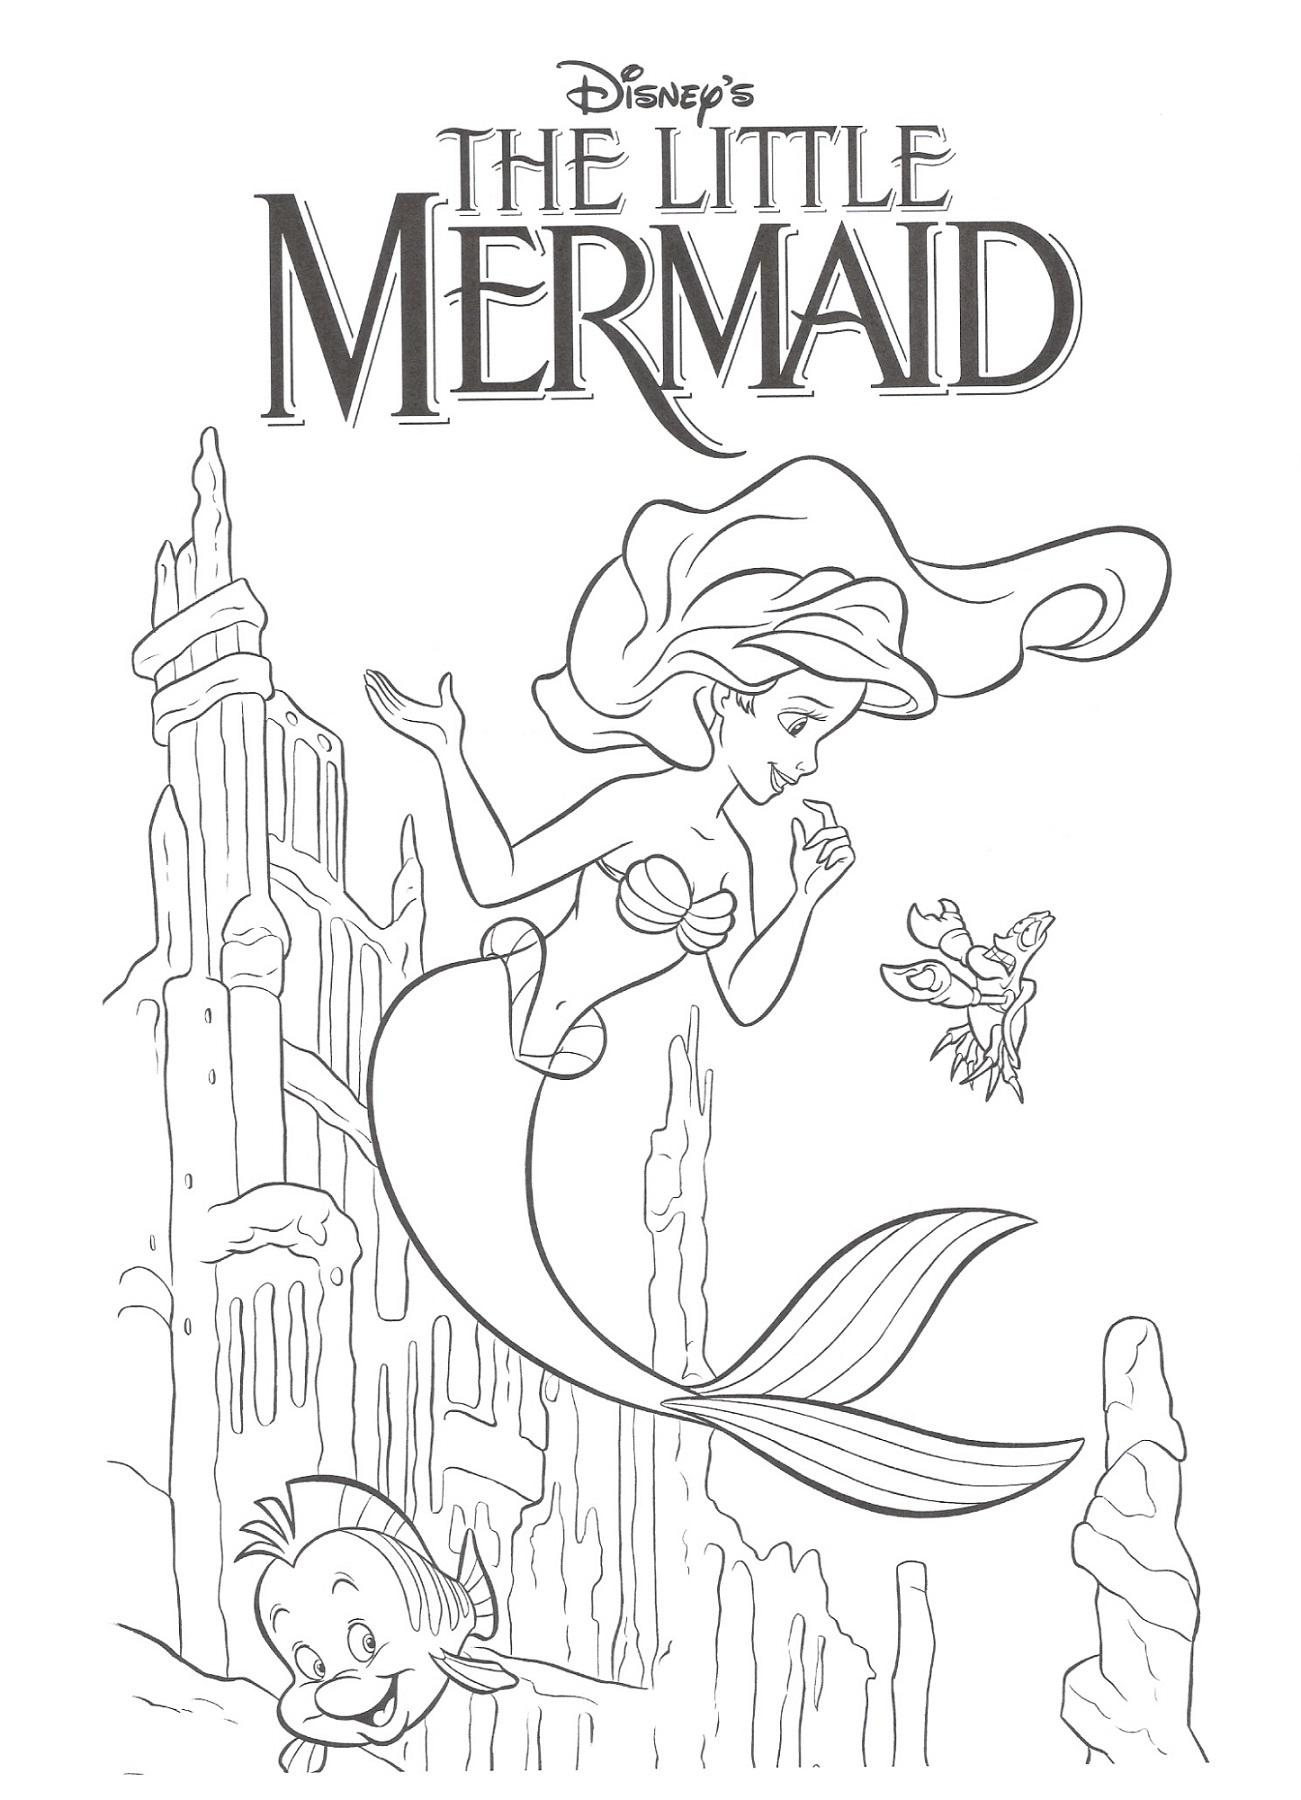 Little Mermaid Activities Coloring